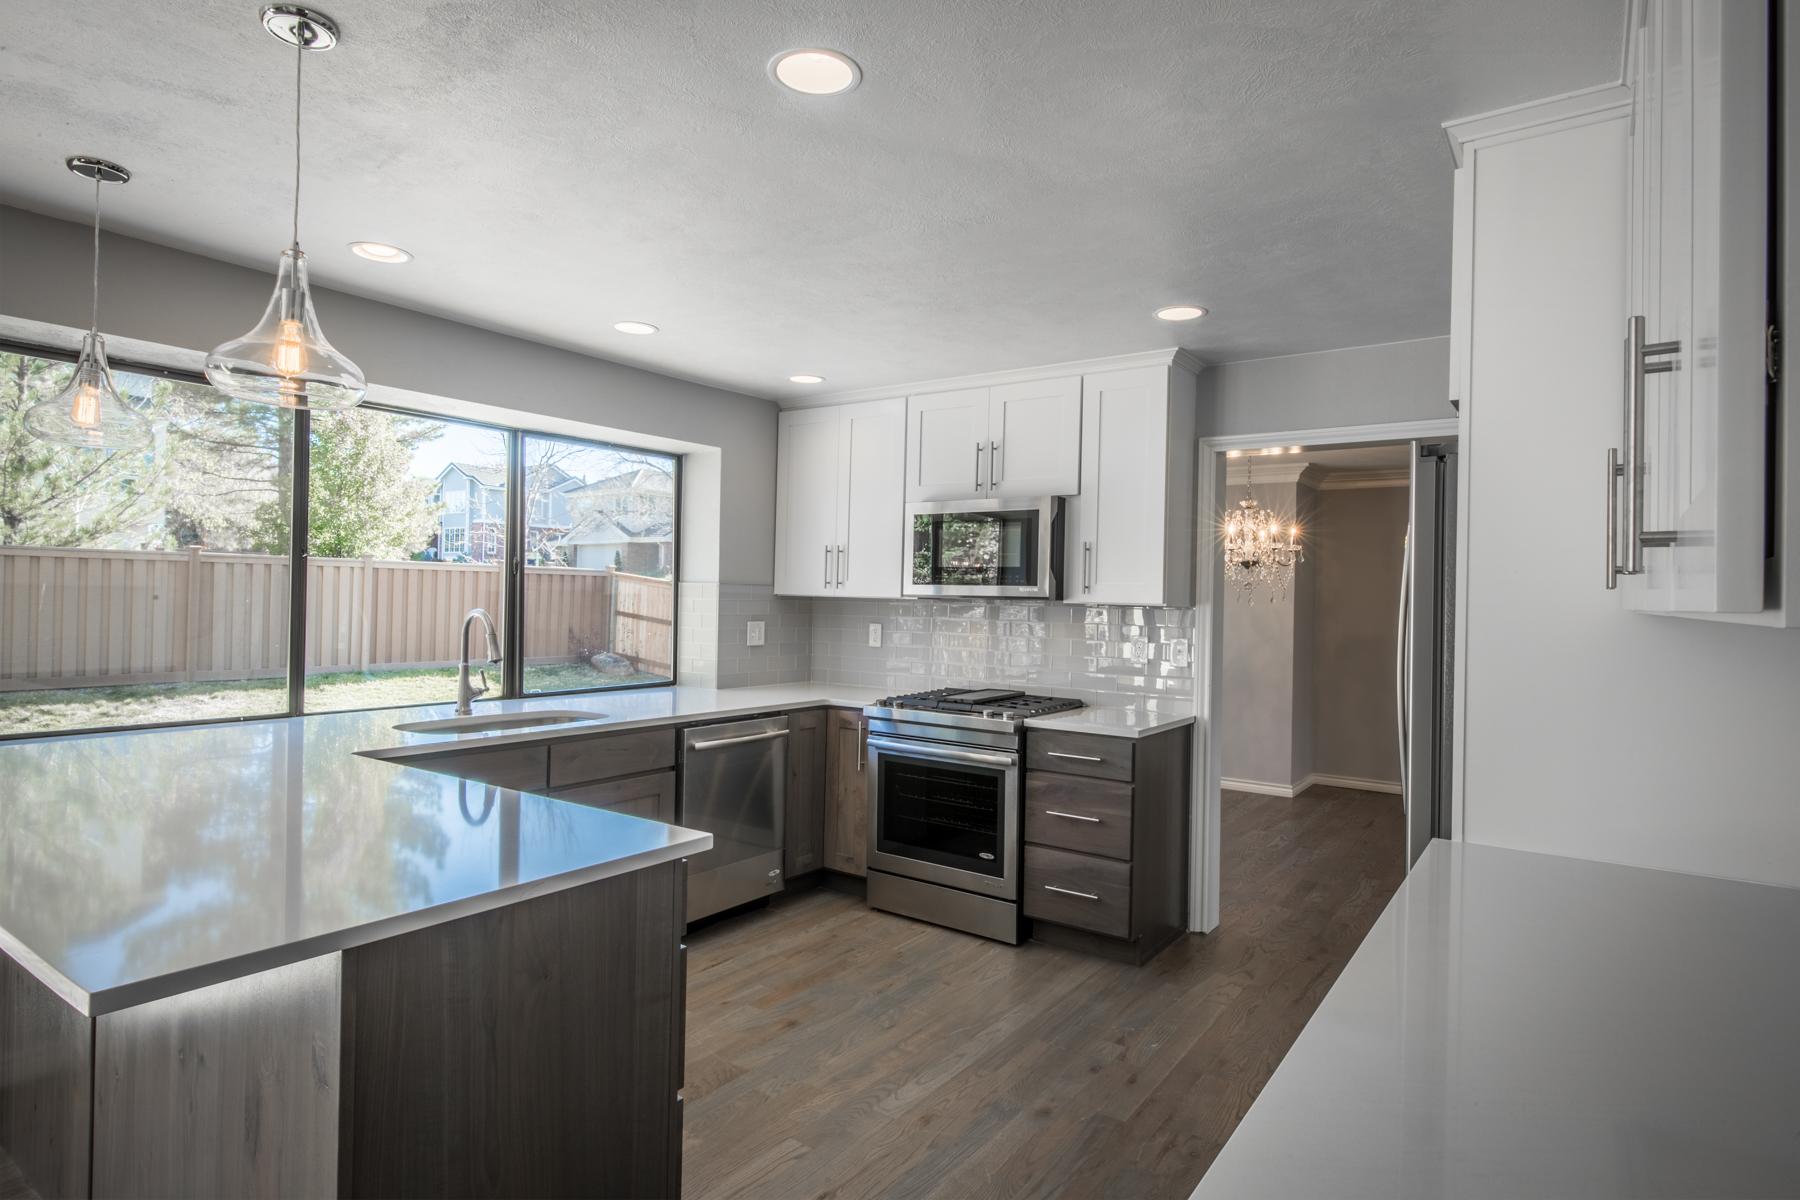 7896 S Fairfax - Kitchen-3.jpg